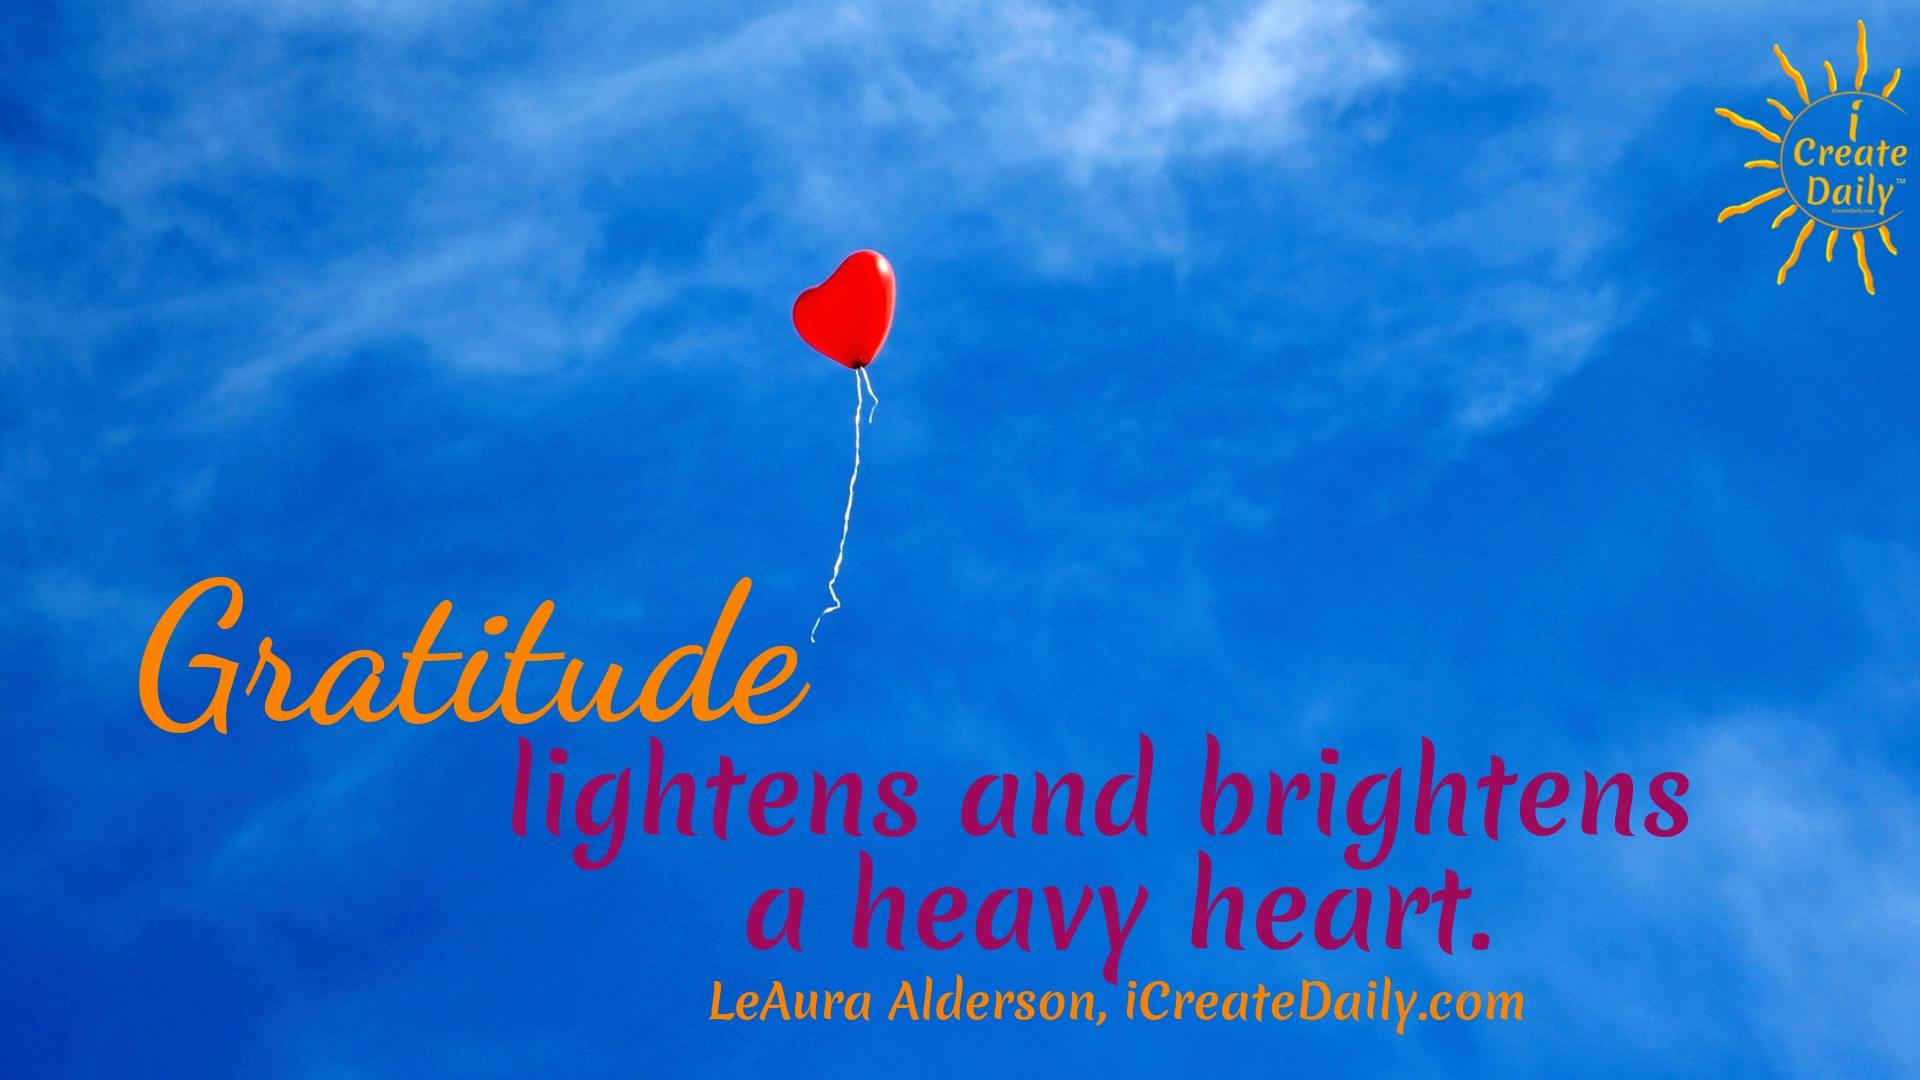 Gratitude Quote: Gratitude lightens and brightens a heavy heart. #GratitudeQuote #Thankful #Gratitude #Positivity #Inspiration